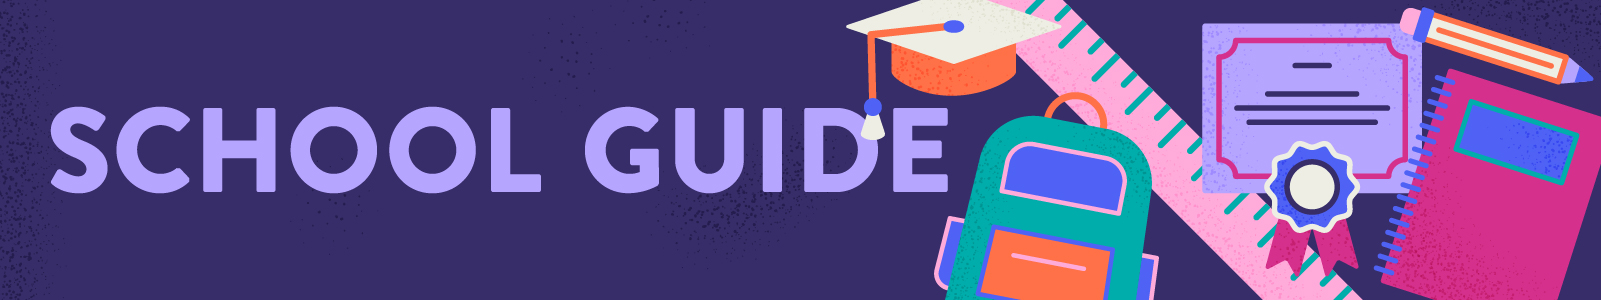 School Guide Header Narrow